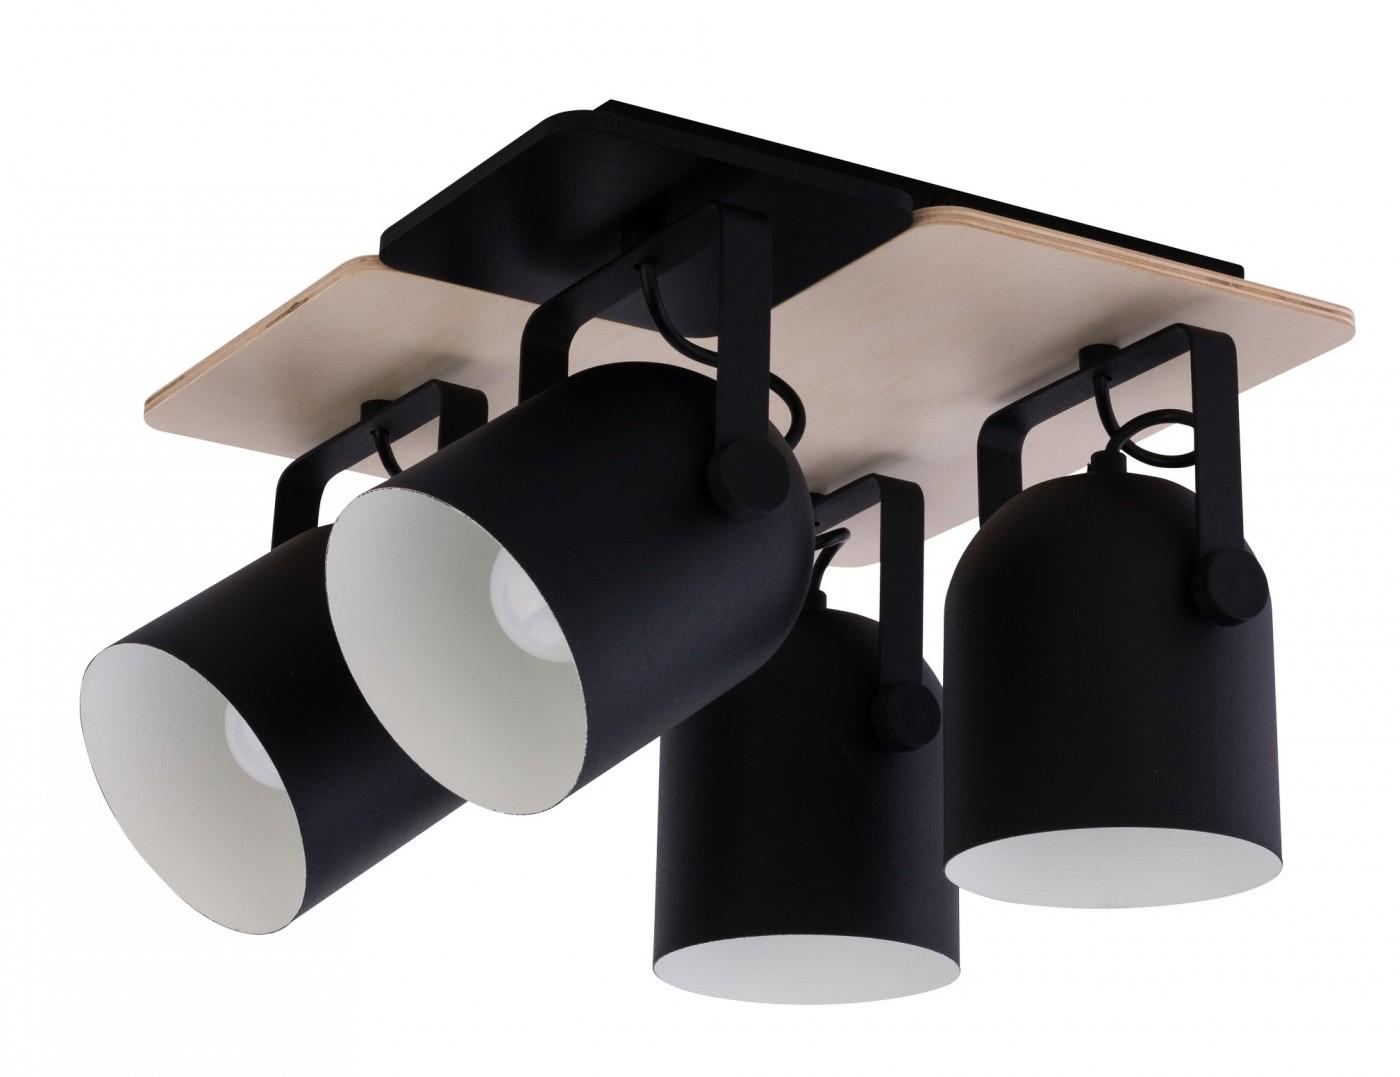 1e0e880bd1b16 SPECTRO black IV 2632 - Lampy-TK sklep fabryczny